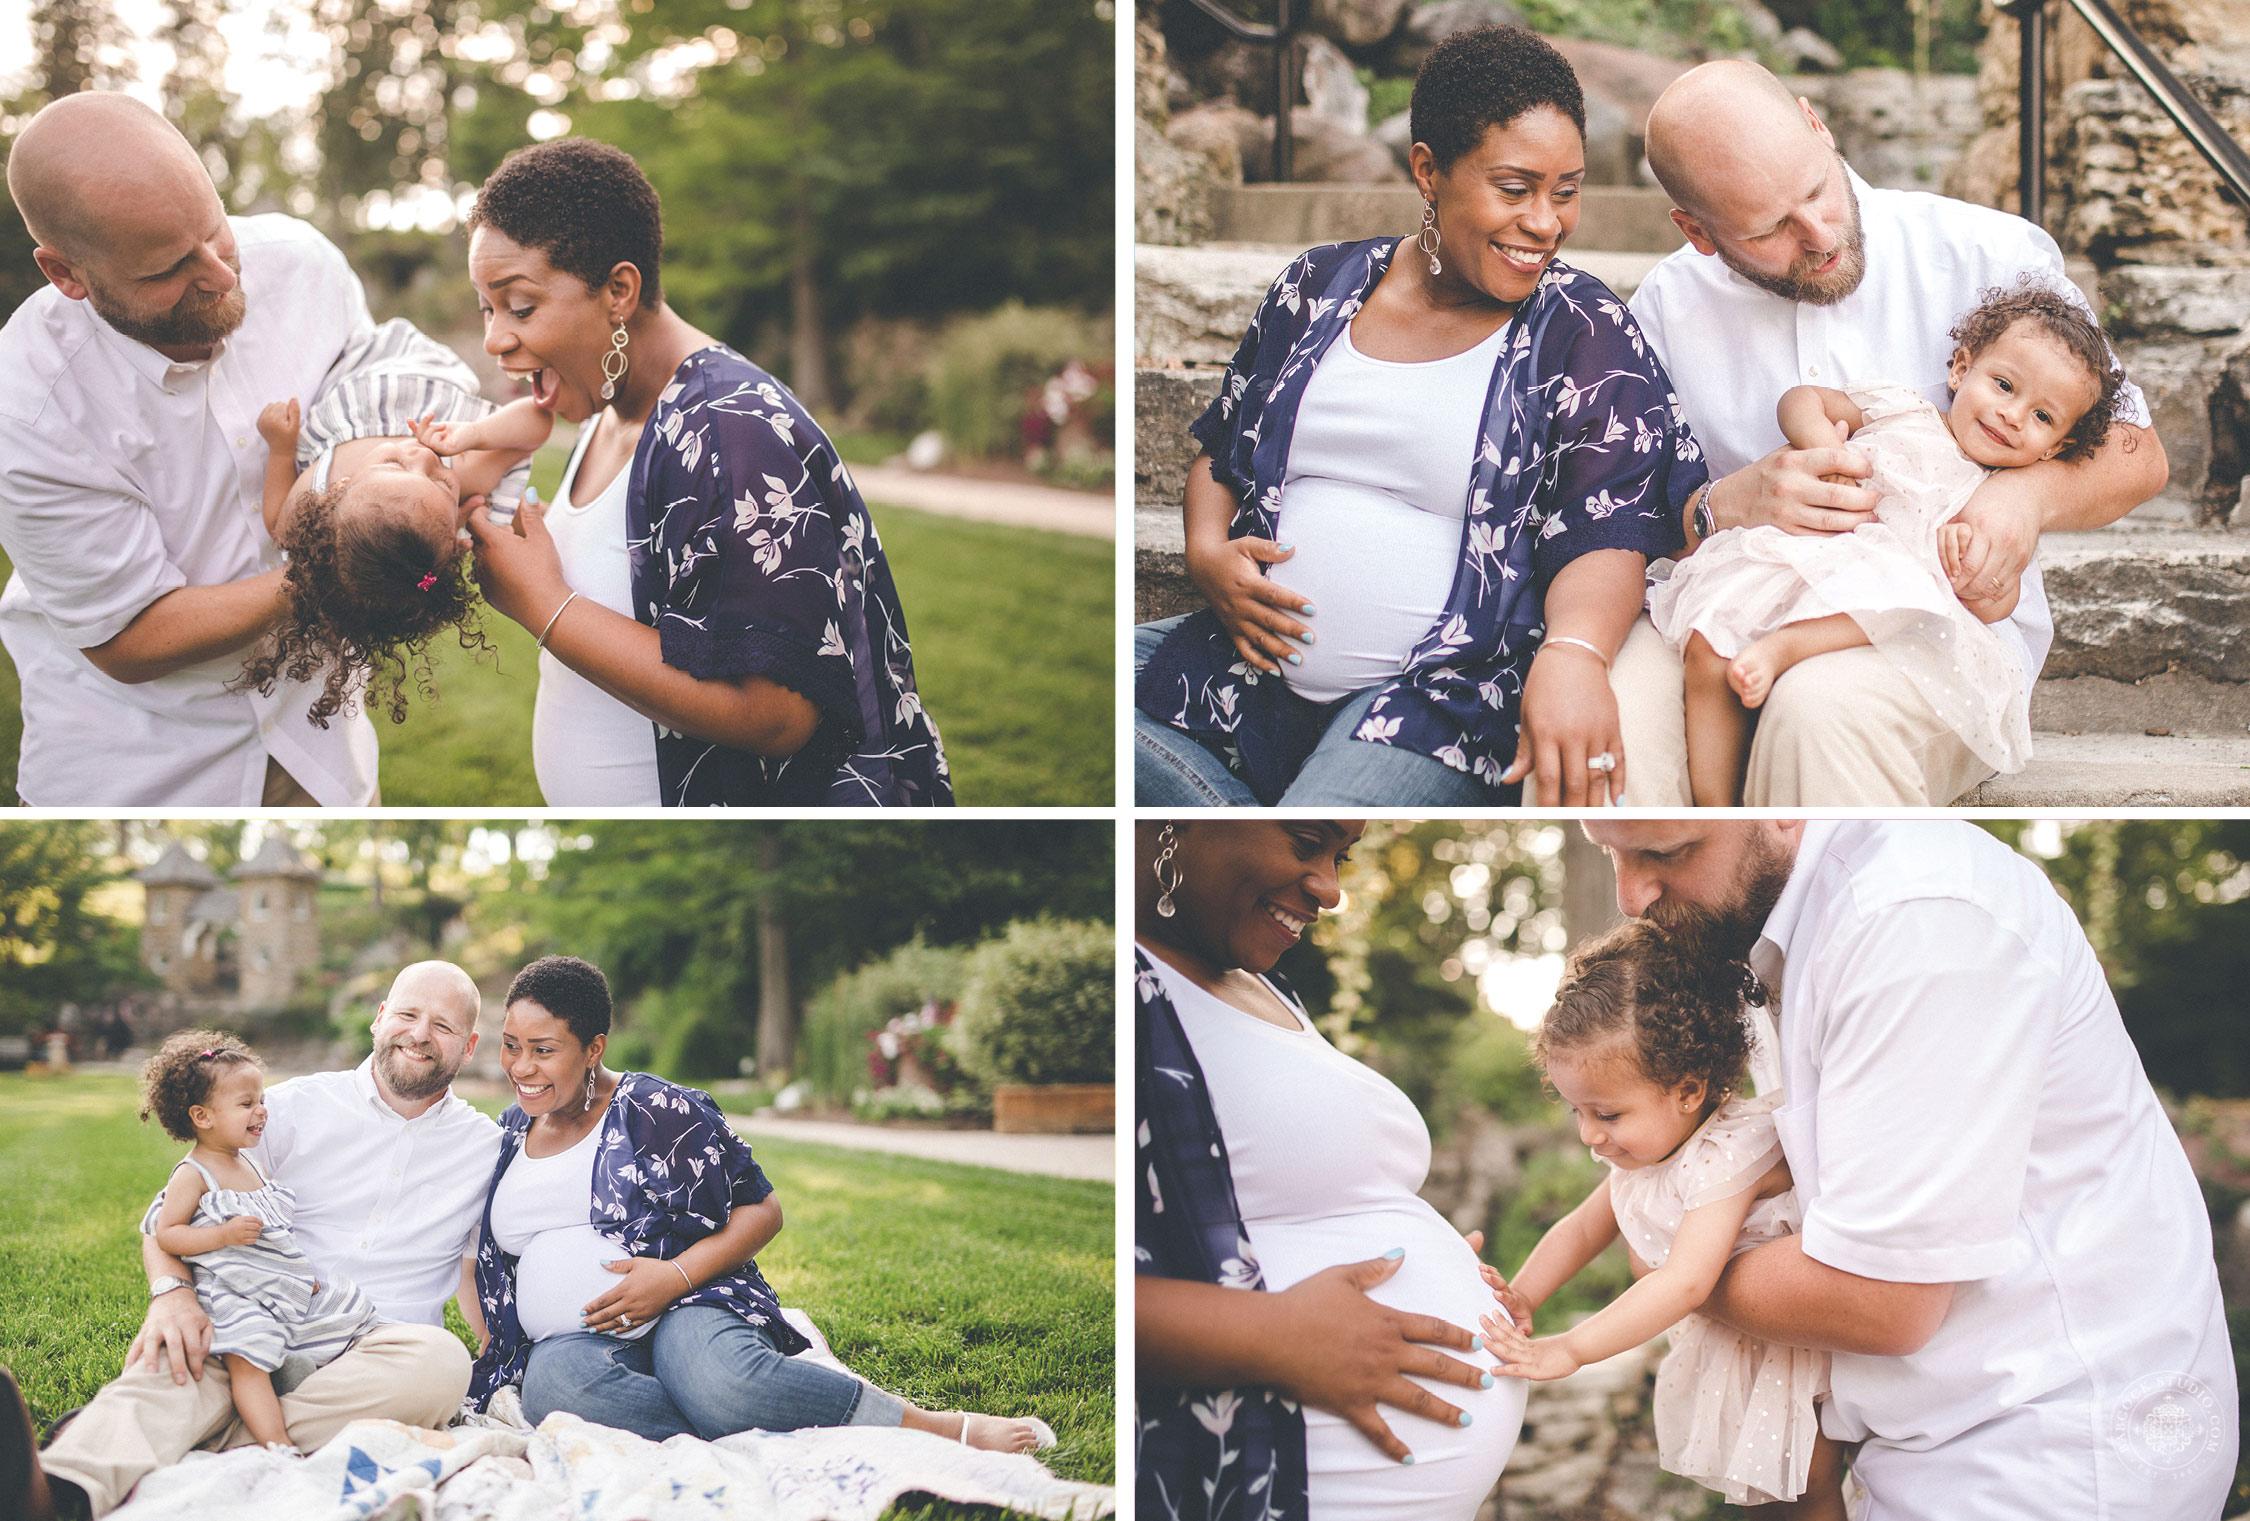 brande-langston-maternity-pregnancy-photographer-dayton-ohio-7.jpg